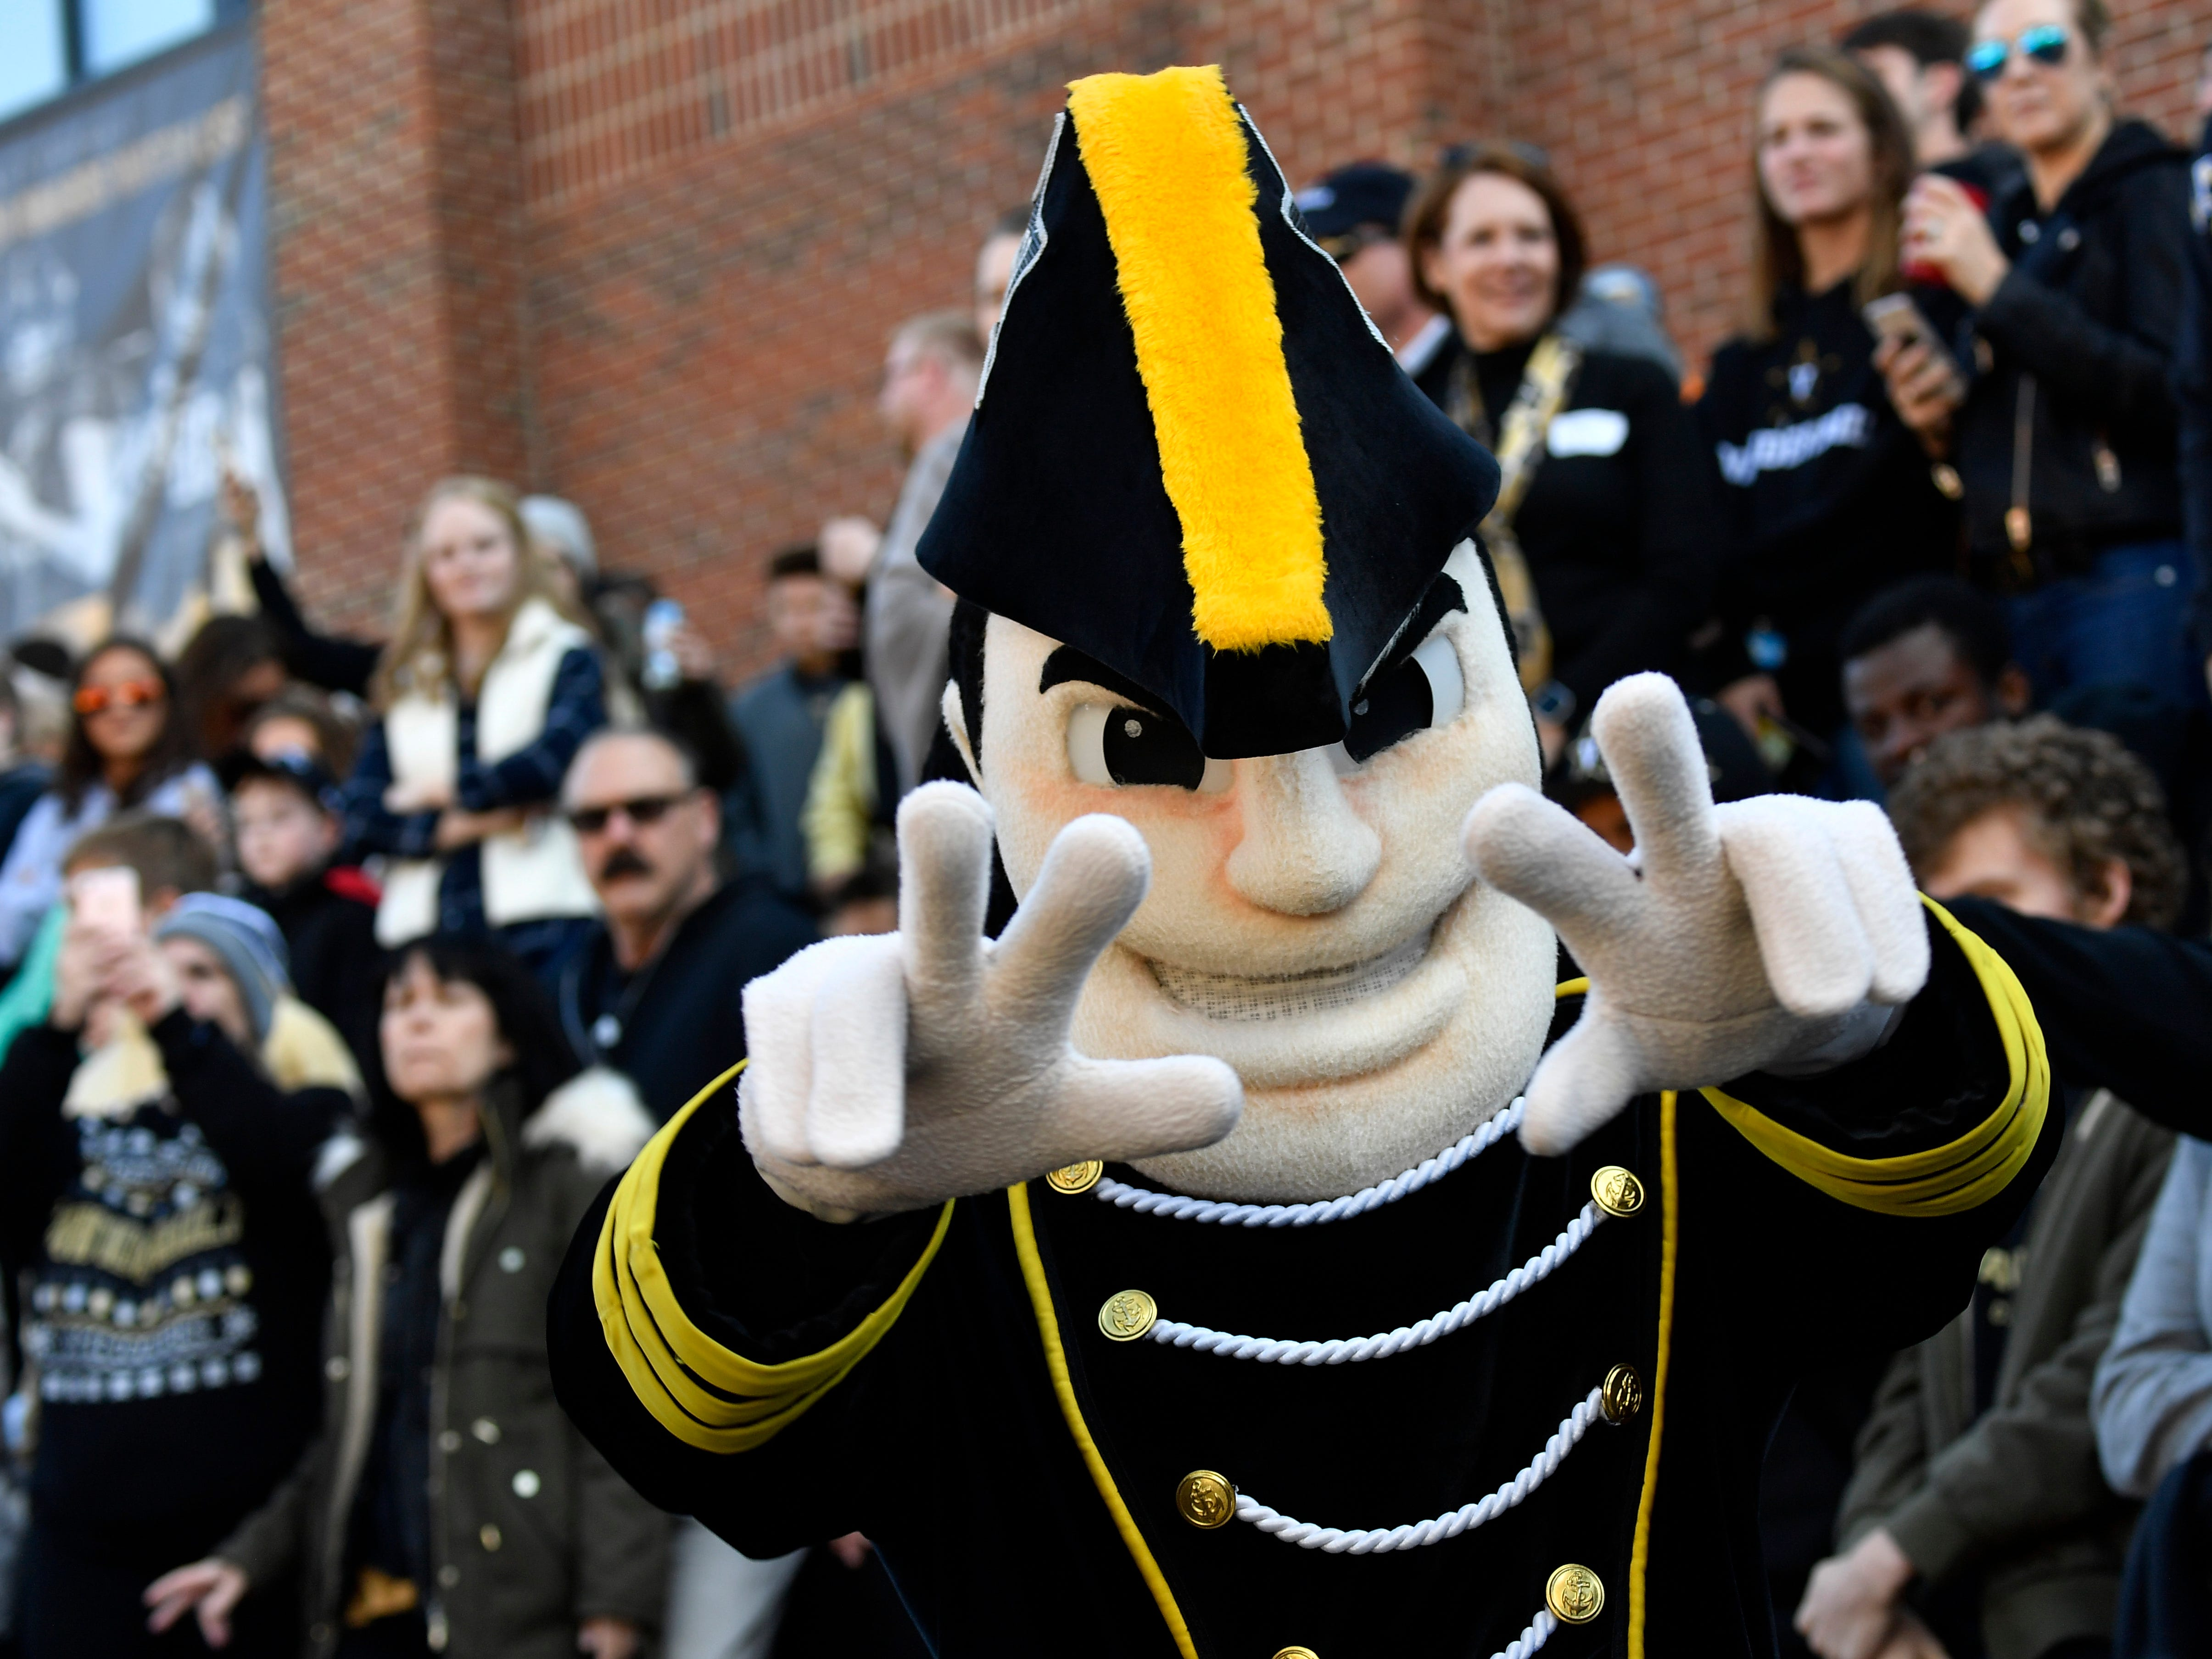 Mr. Commodore cheers for Vanderbilt before the game at Vanderbilt Stadium Saturday, Nov. 24, 2018, in Nashville, Tenn.